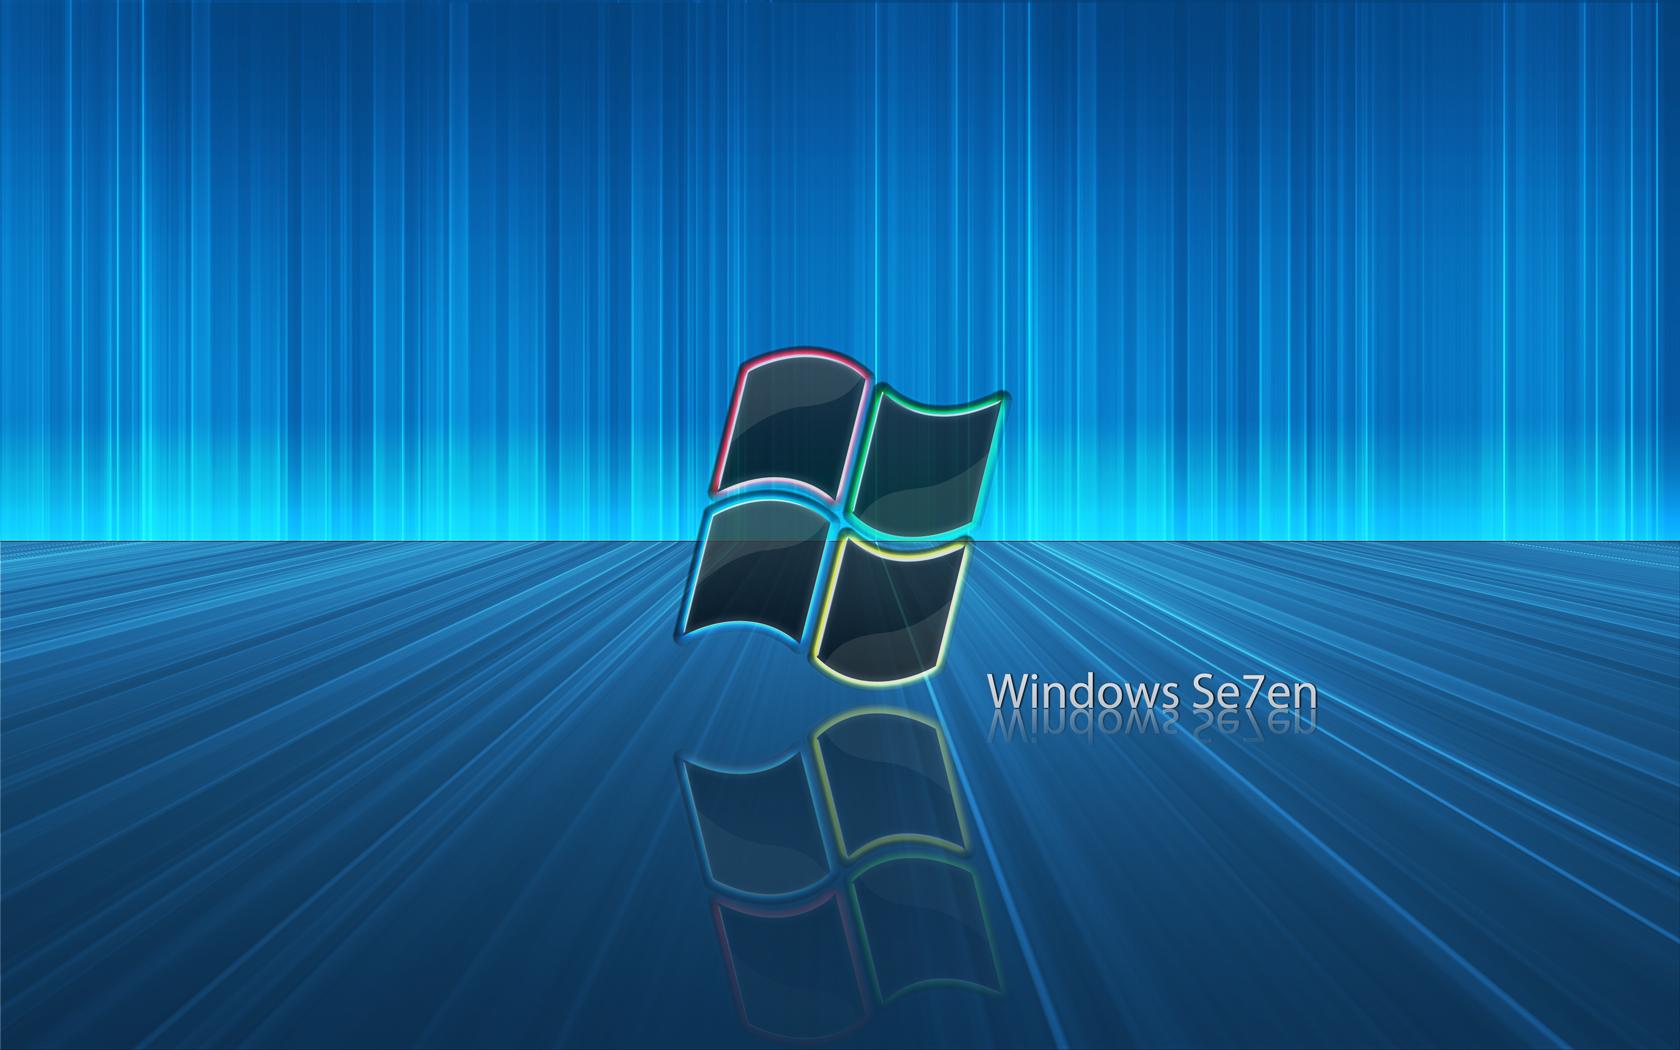 Wallpapers Windows 7 1680x1050